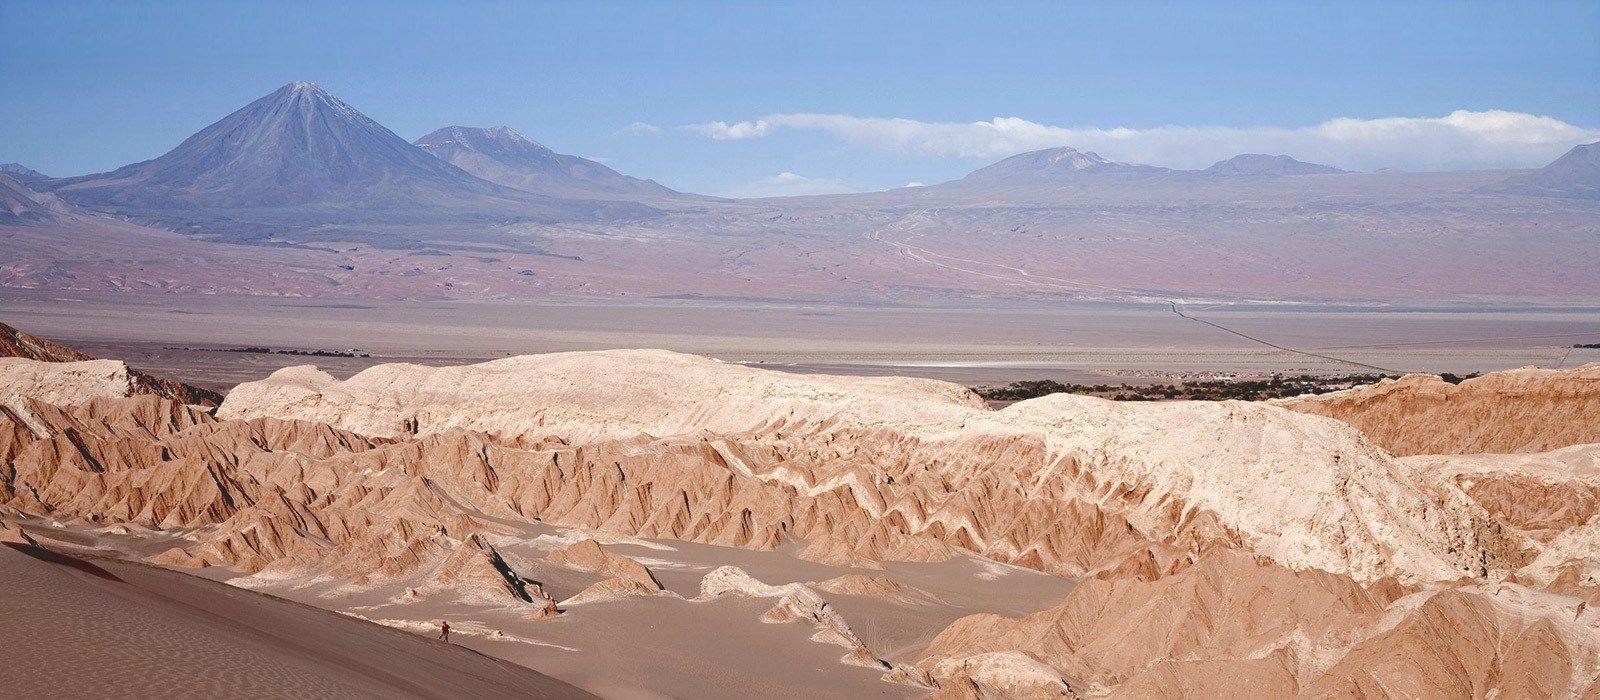 South America: An Epic Exploration Tour Trip 2